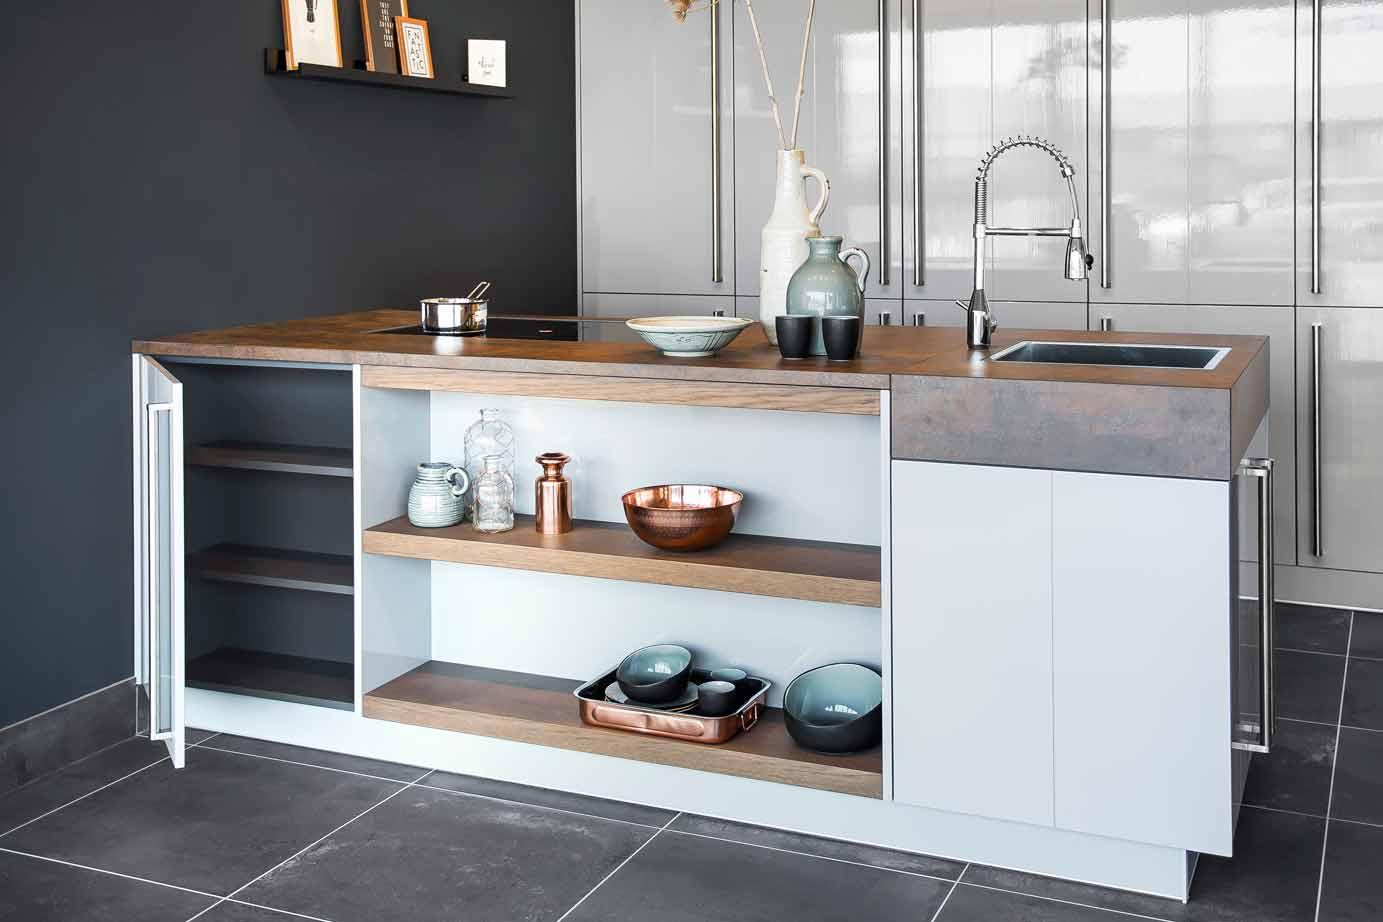 Design keukeneiland met kastenwand super chique db keukens